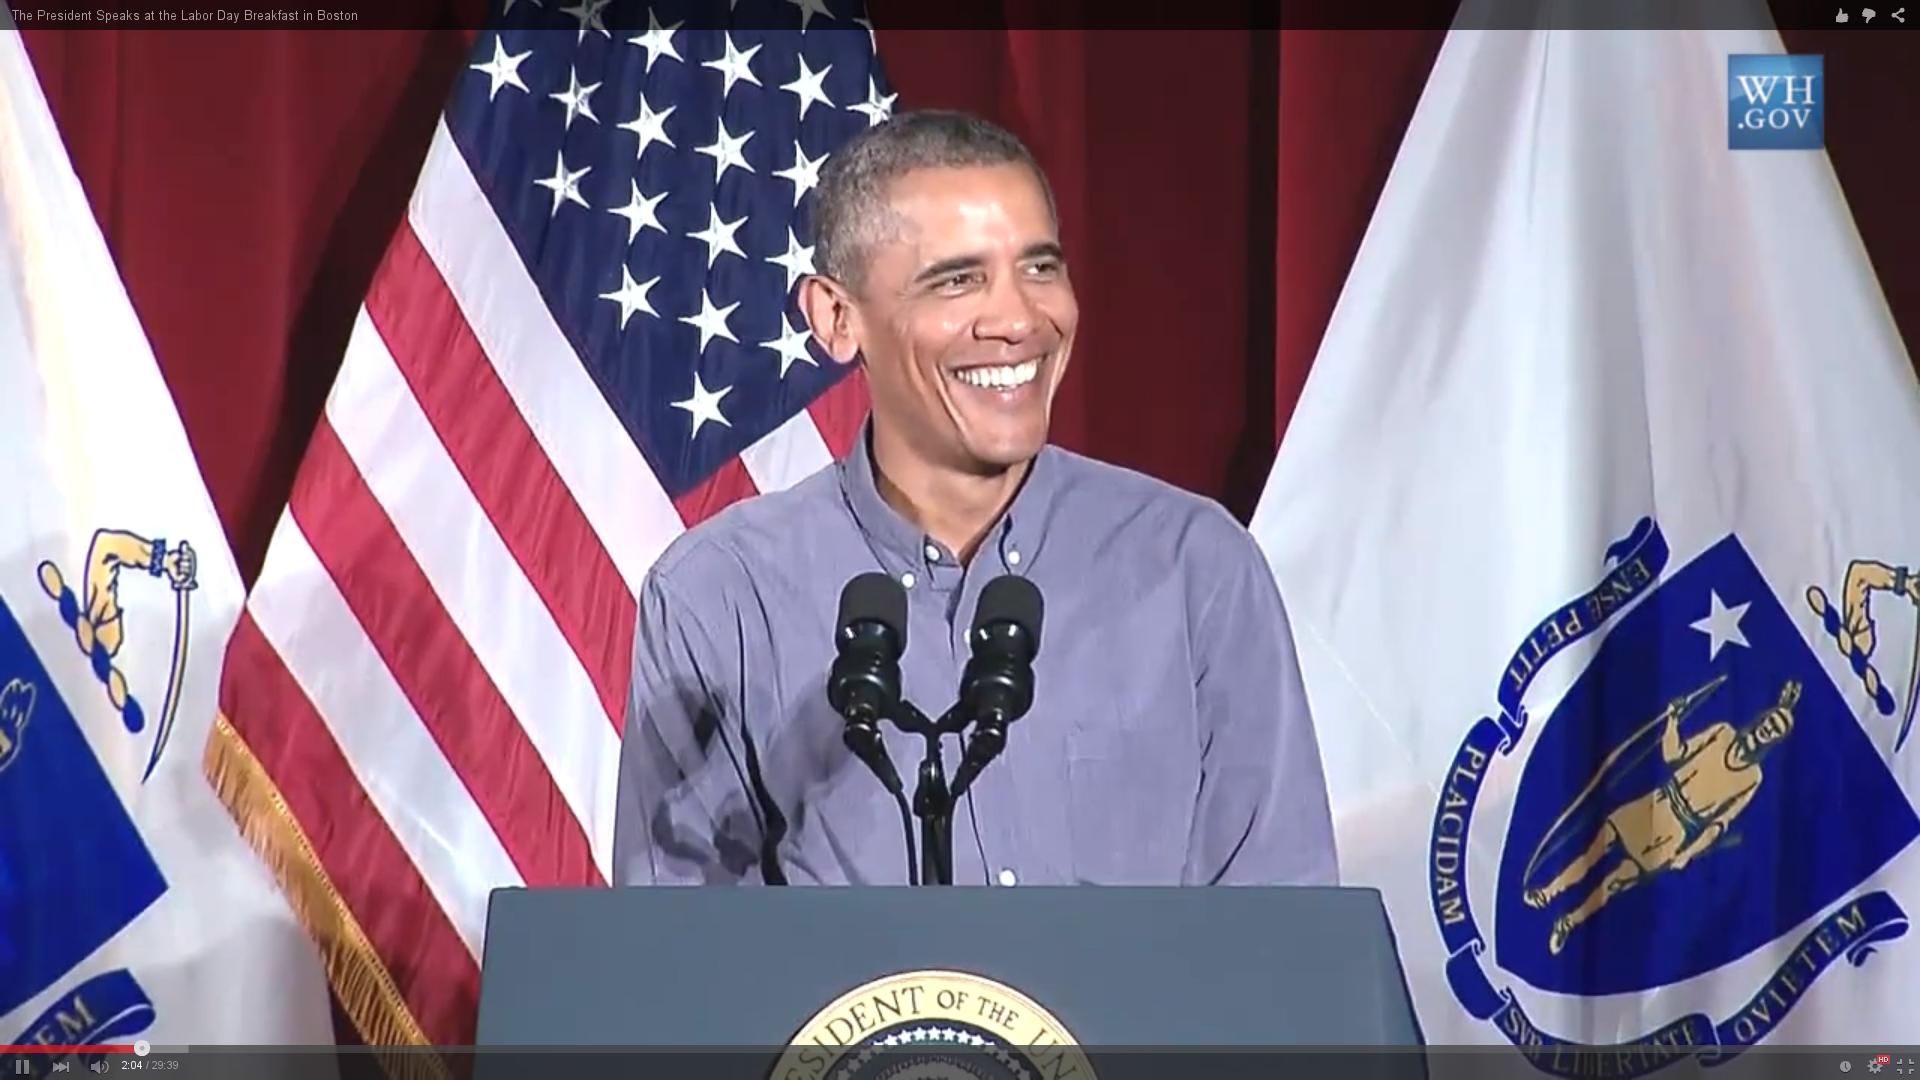 President Obama speaks at the 2015 Labor Day Breakfast